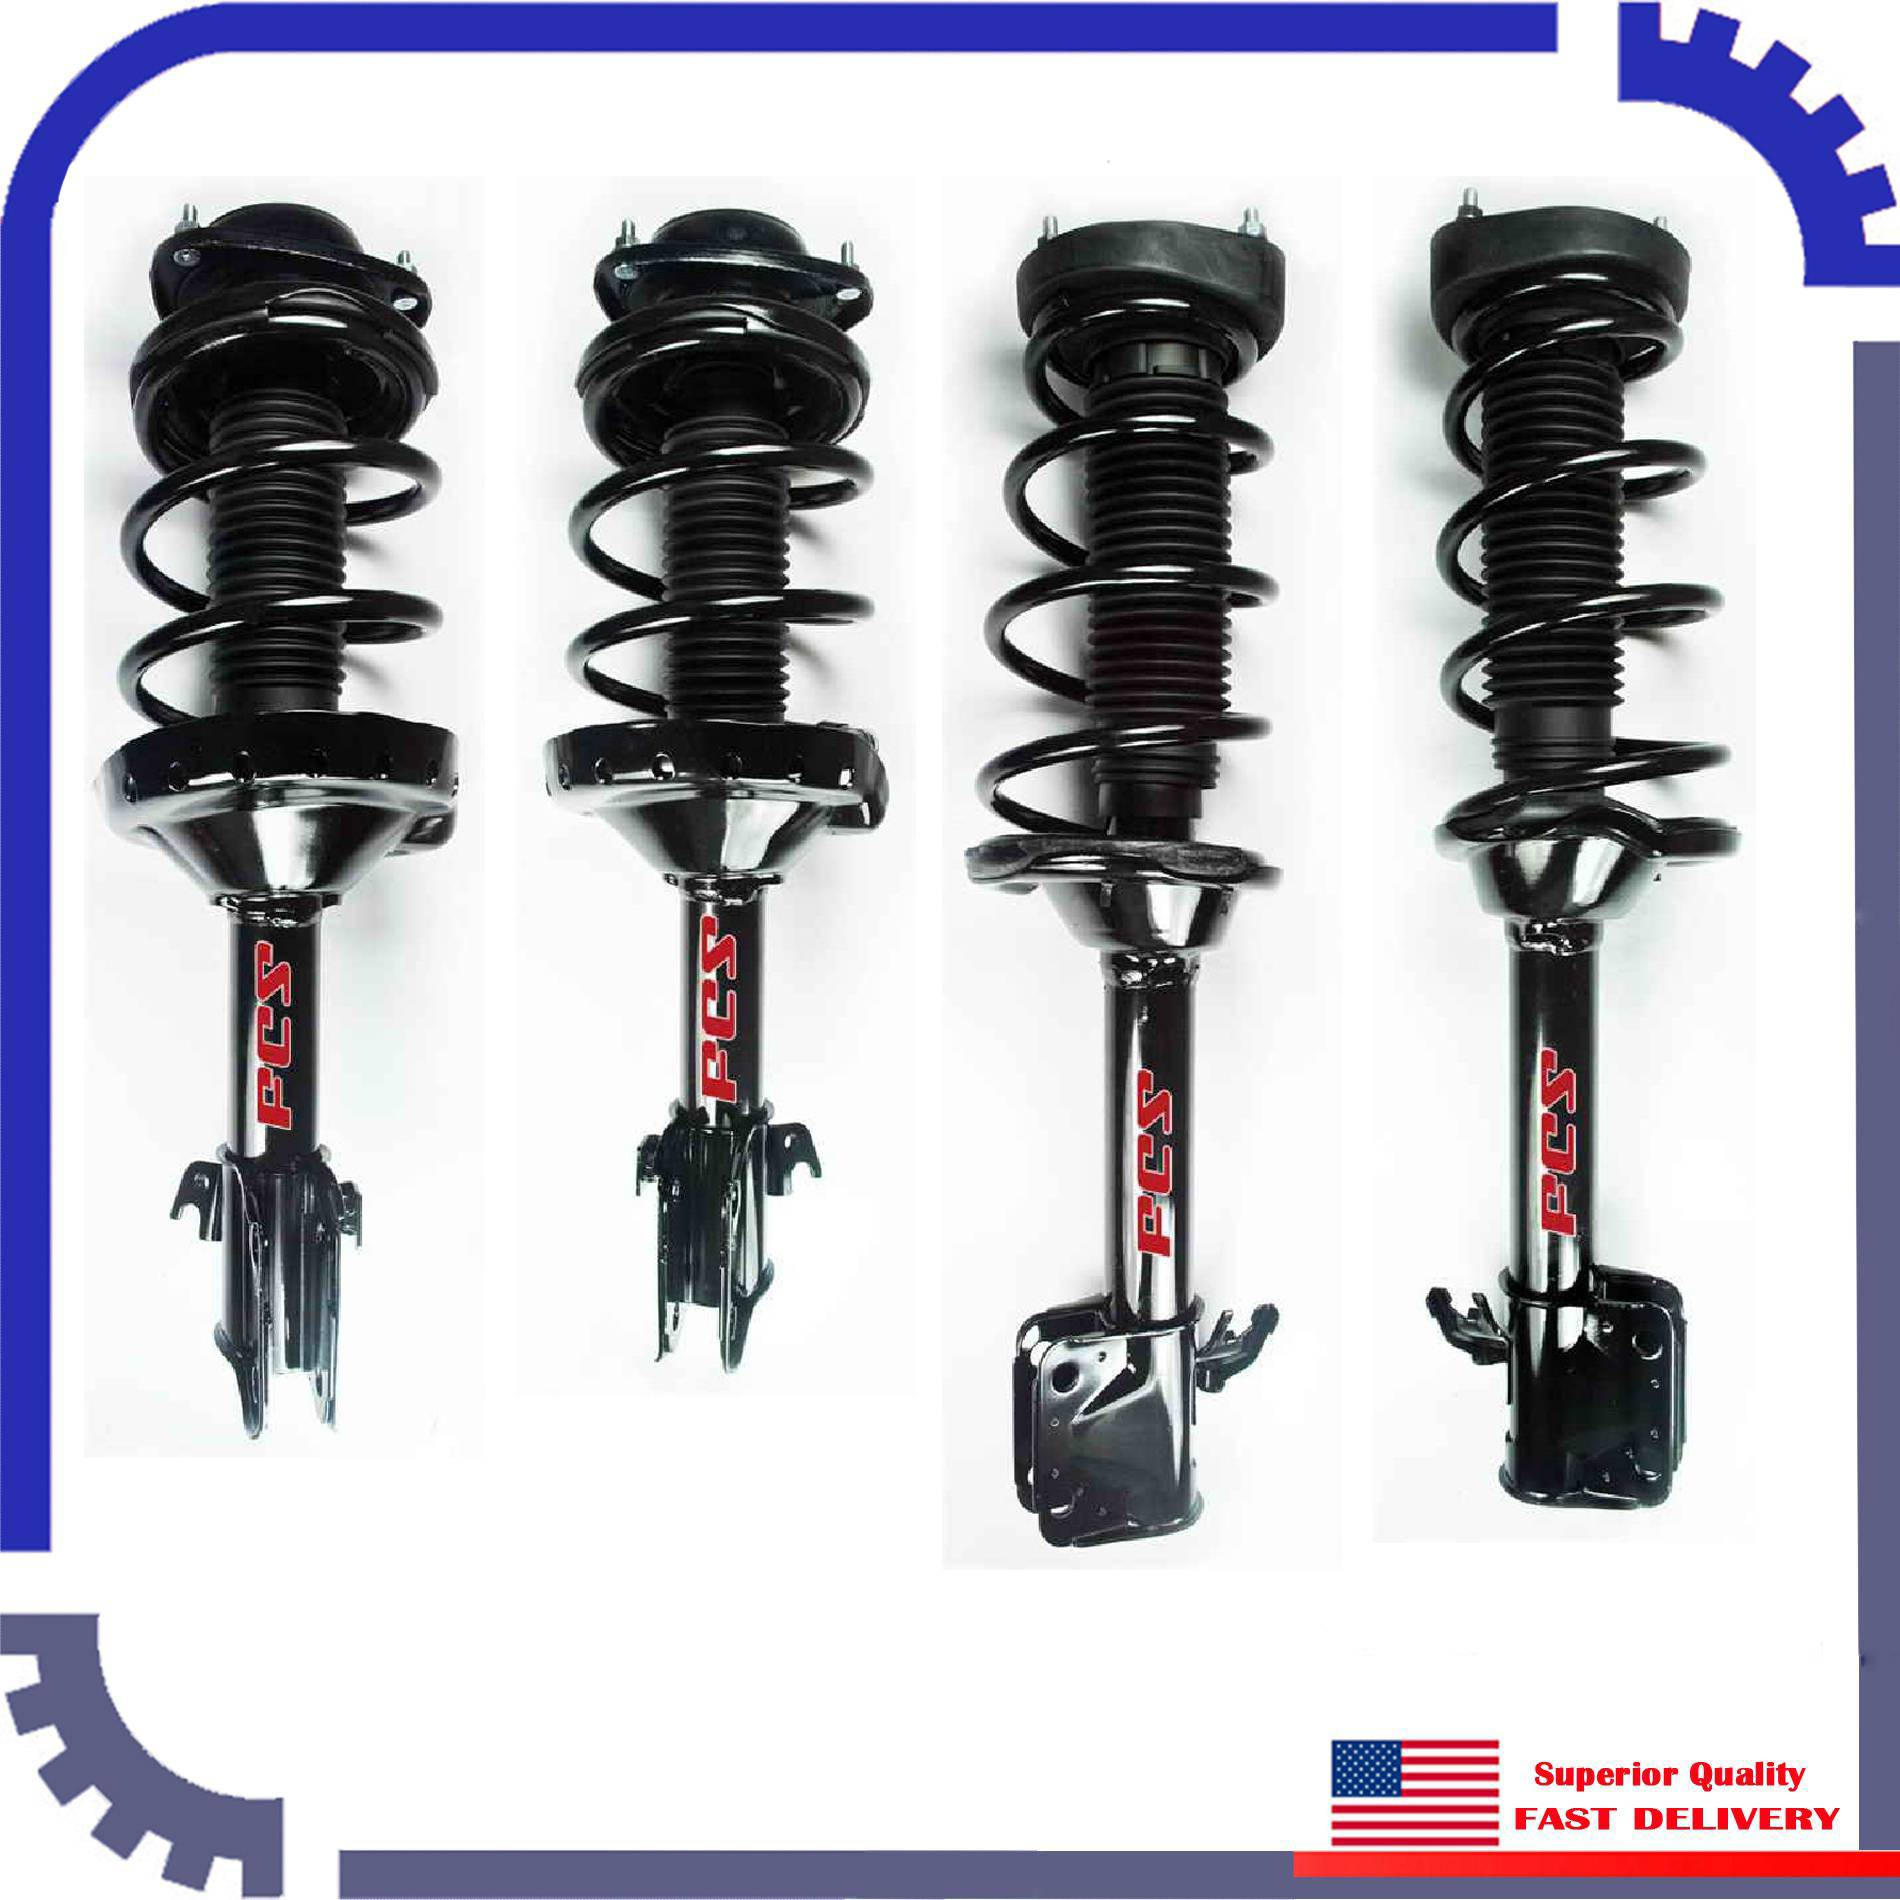 Suspension Strut Assembly Rear FCS 345763 fits 12-15 Subaru Impreza